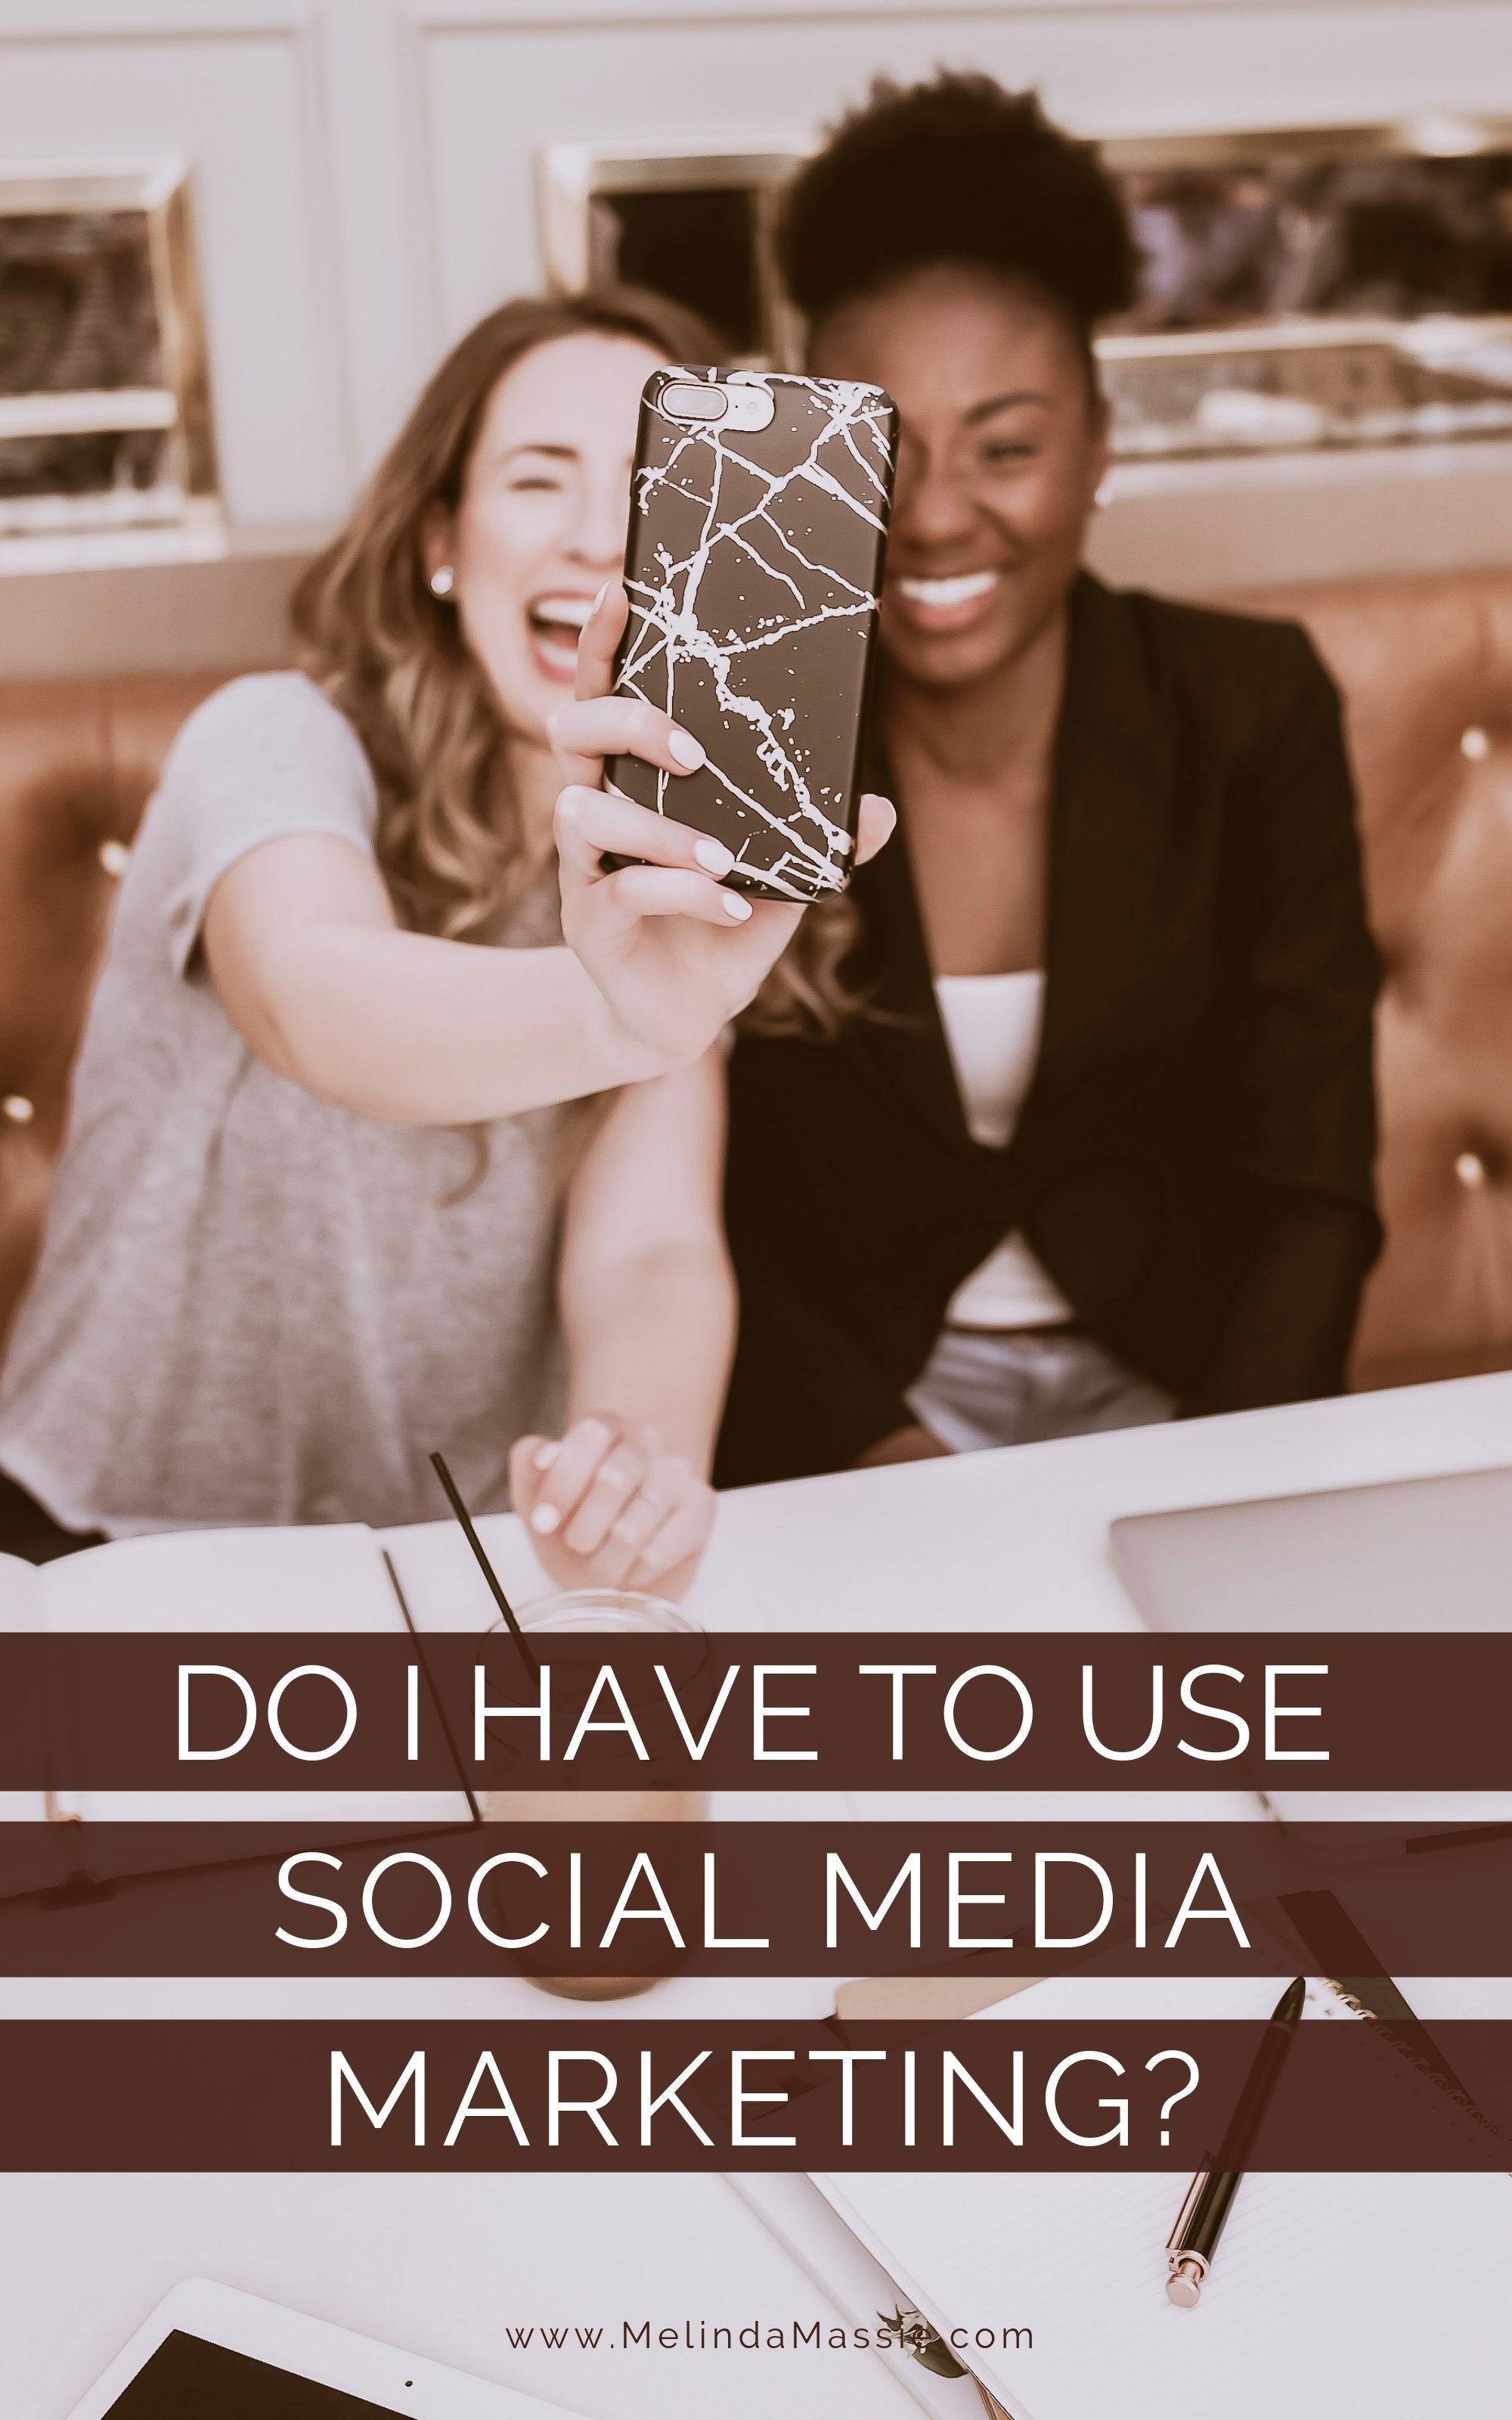 Do I have to use social media marketing? - Melinda Massie Marketing Blog